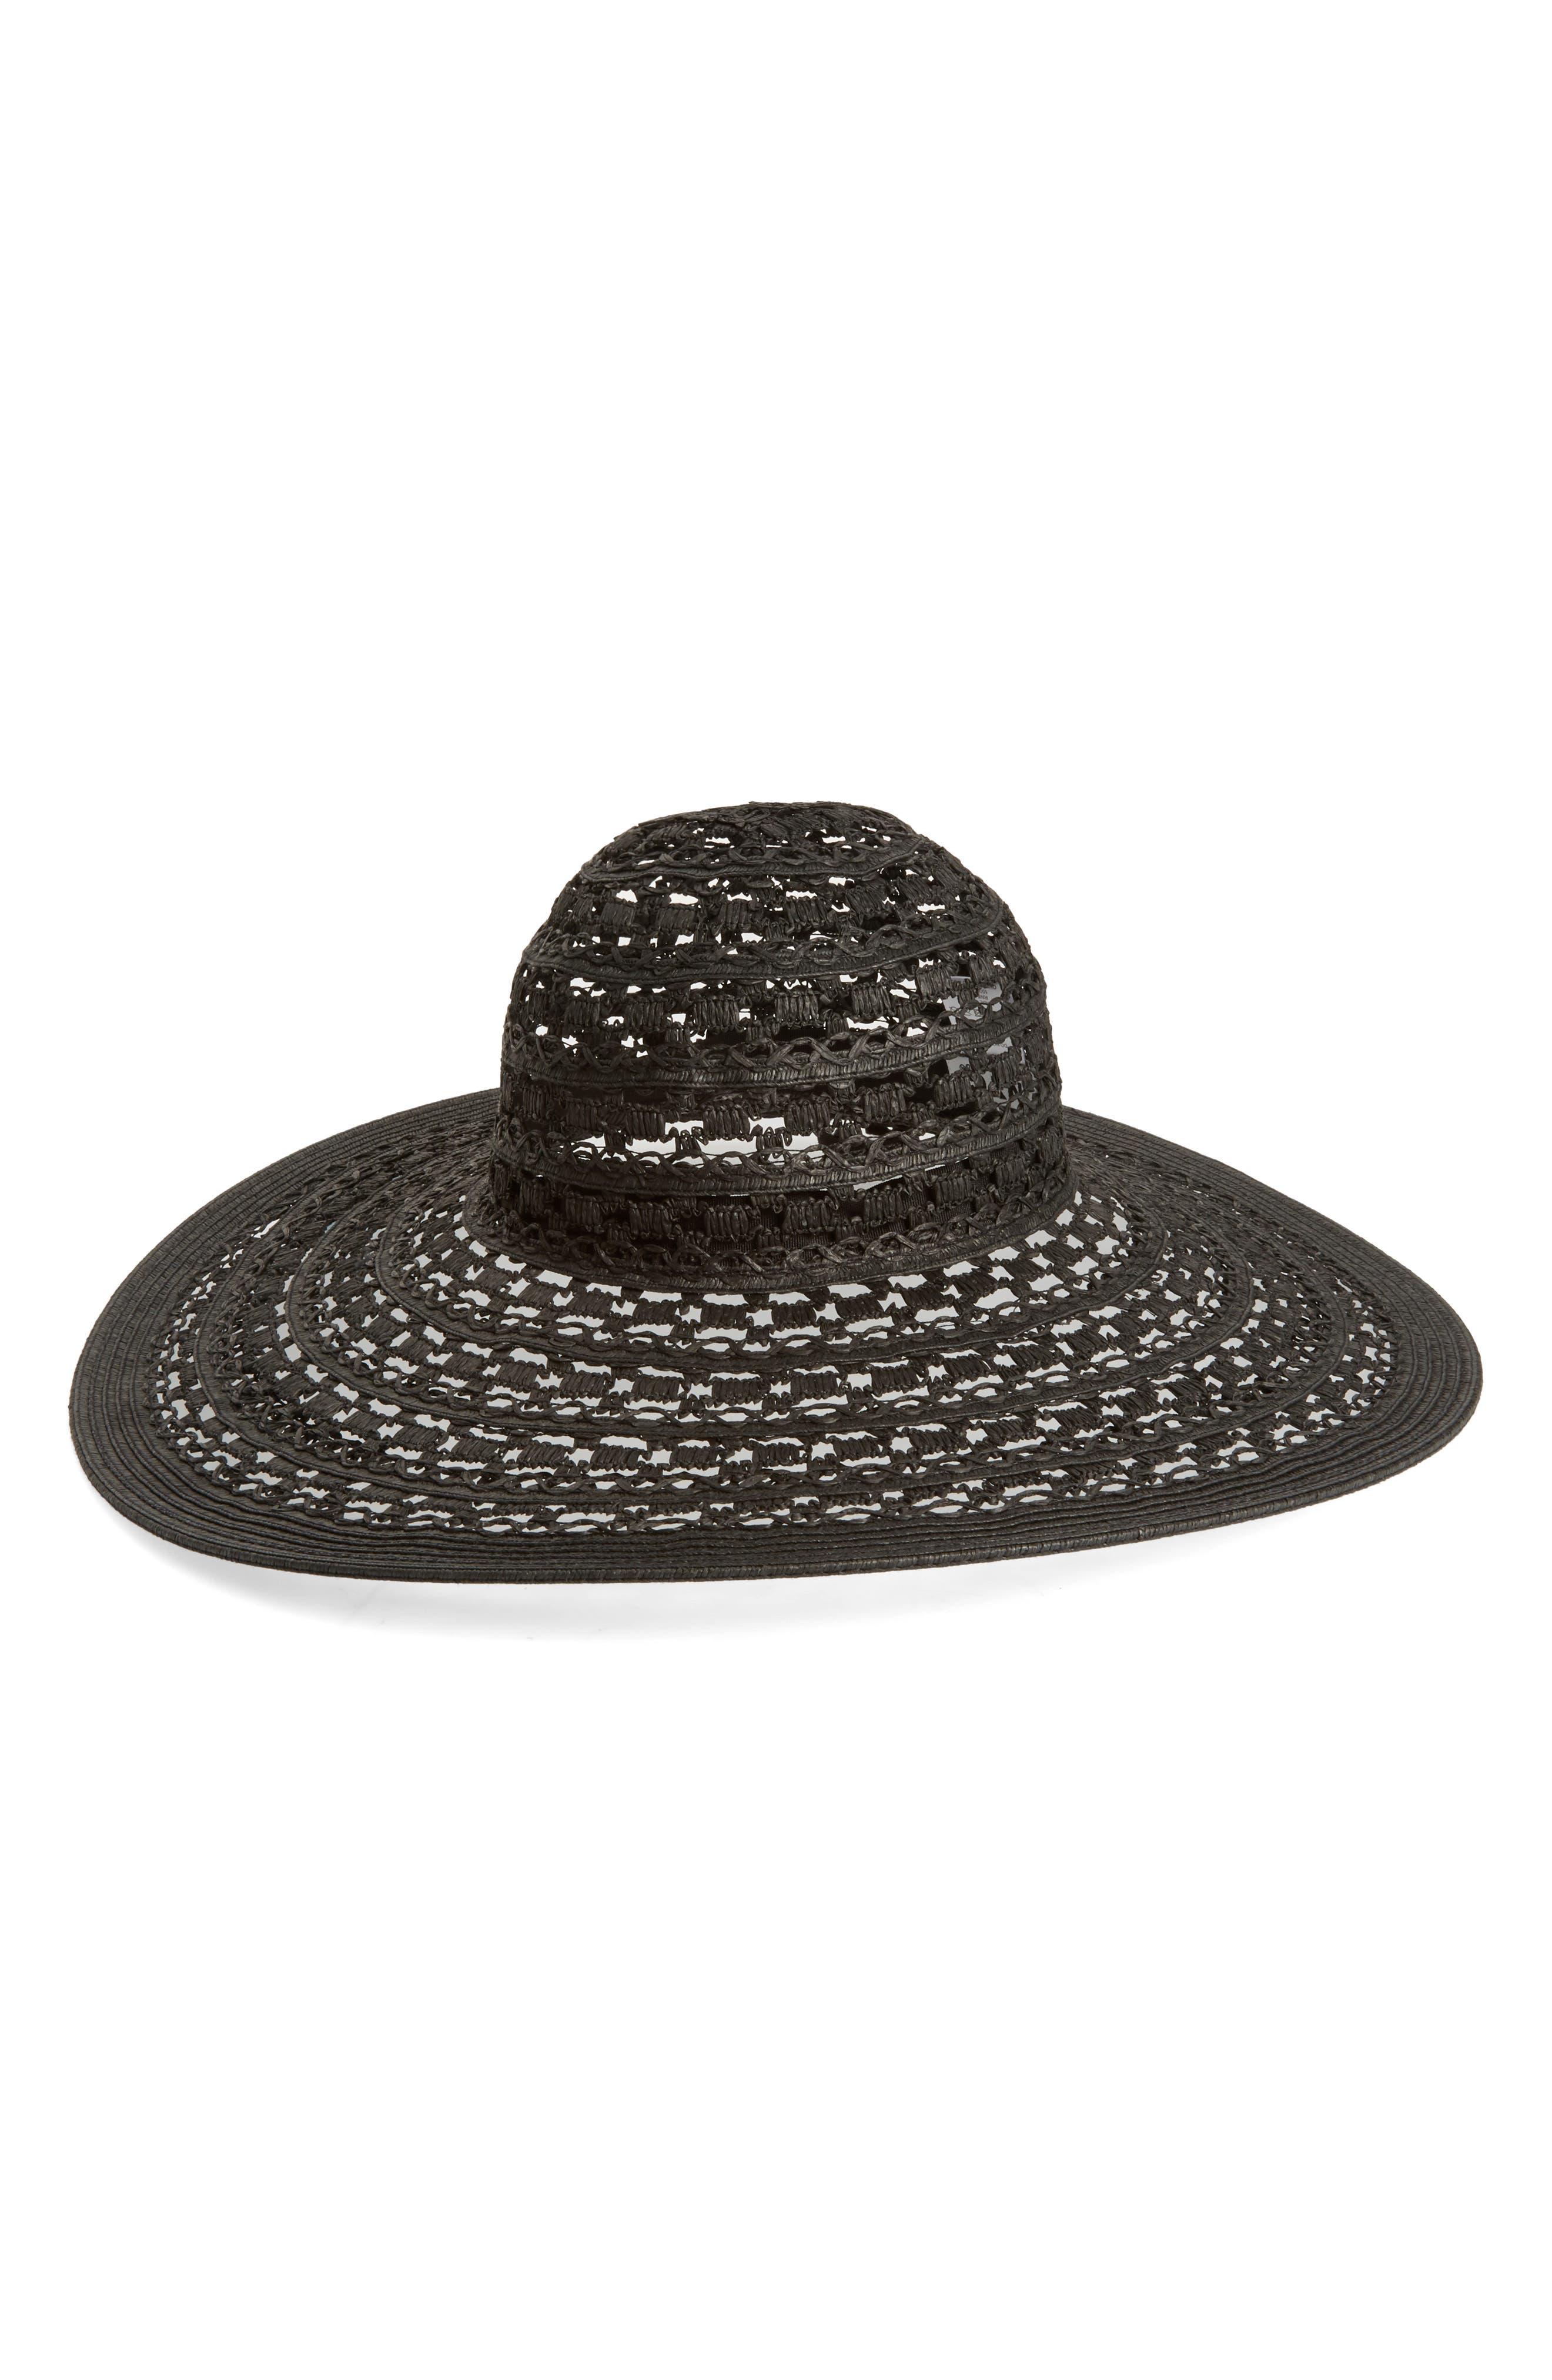 NYC UNDERGROUND Floppy Straw Hat